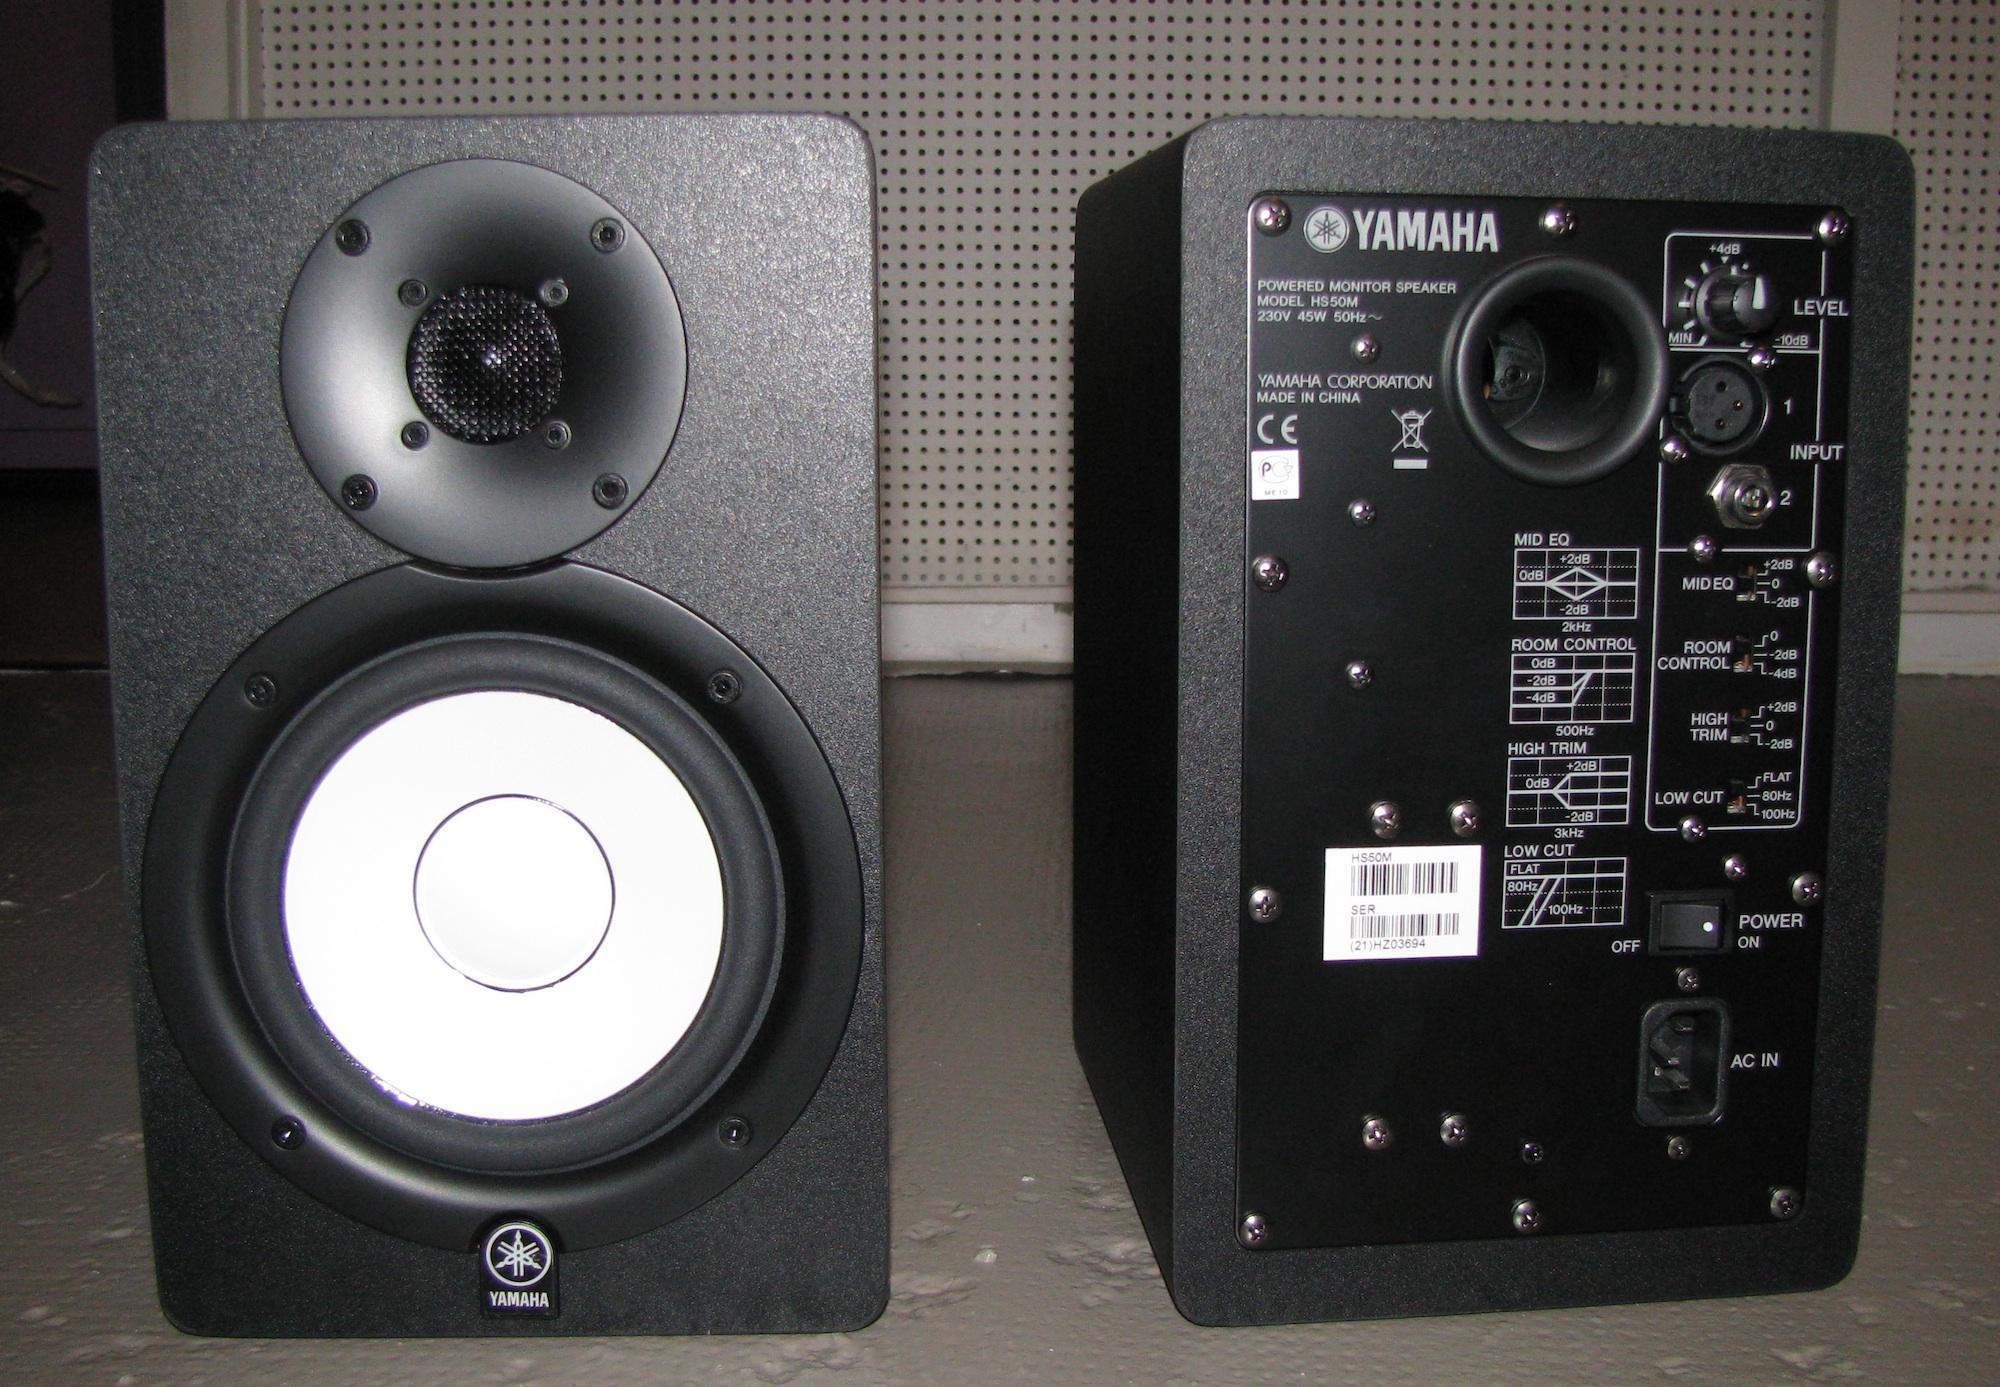 Yamaha hs50m image 589356 audiofanzine for Yamaha hs50m review